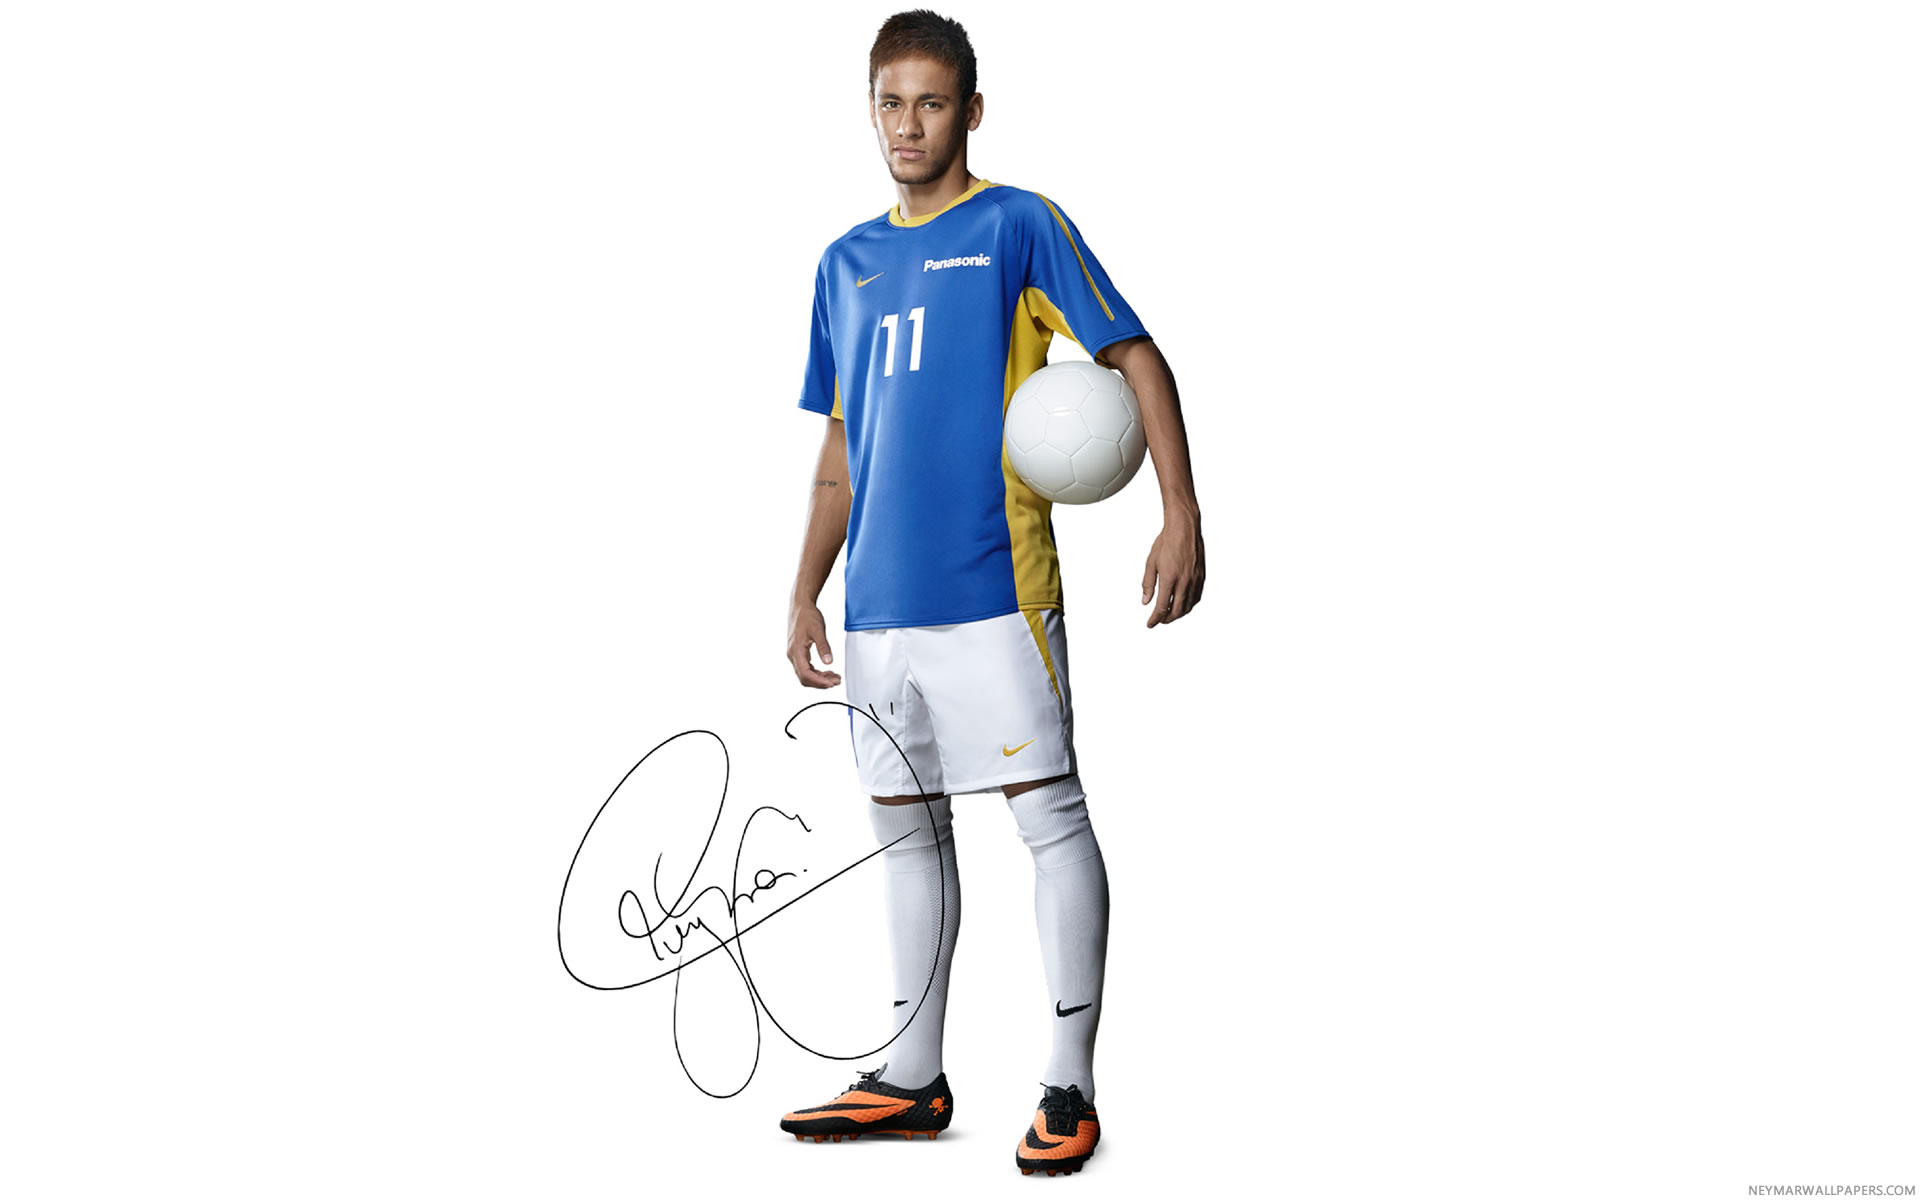 Neymar Panasonic Commercial